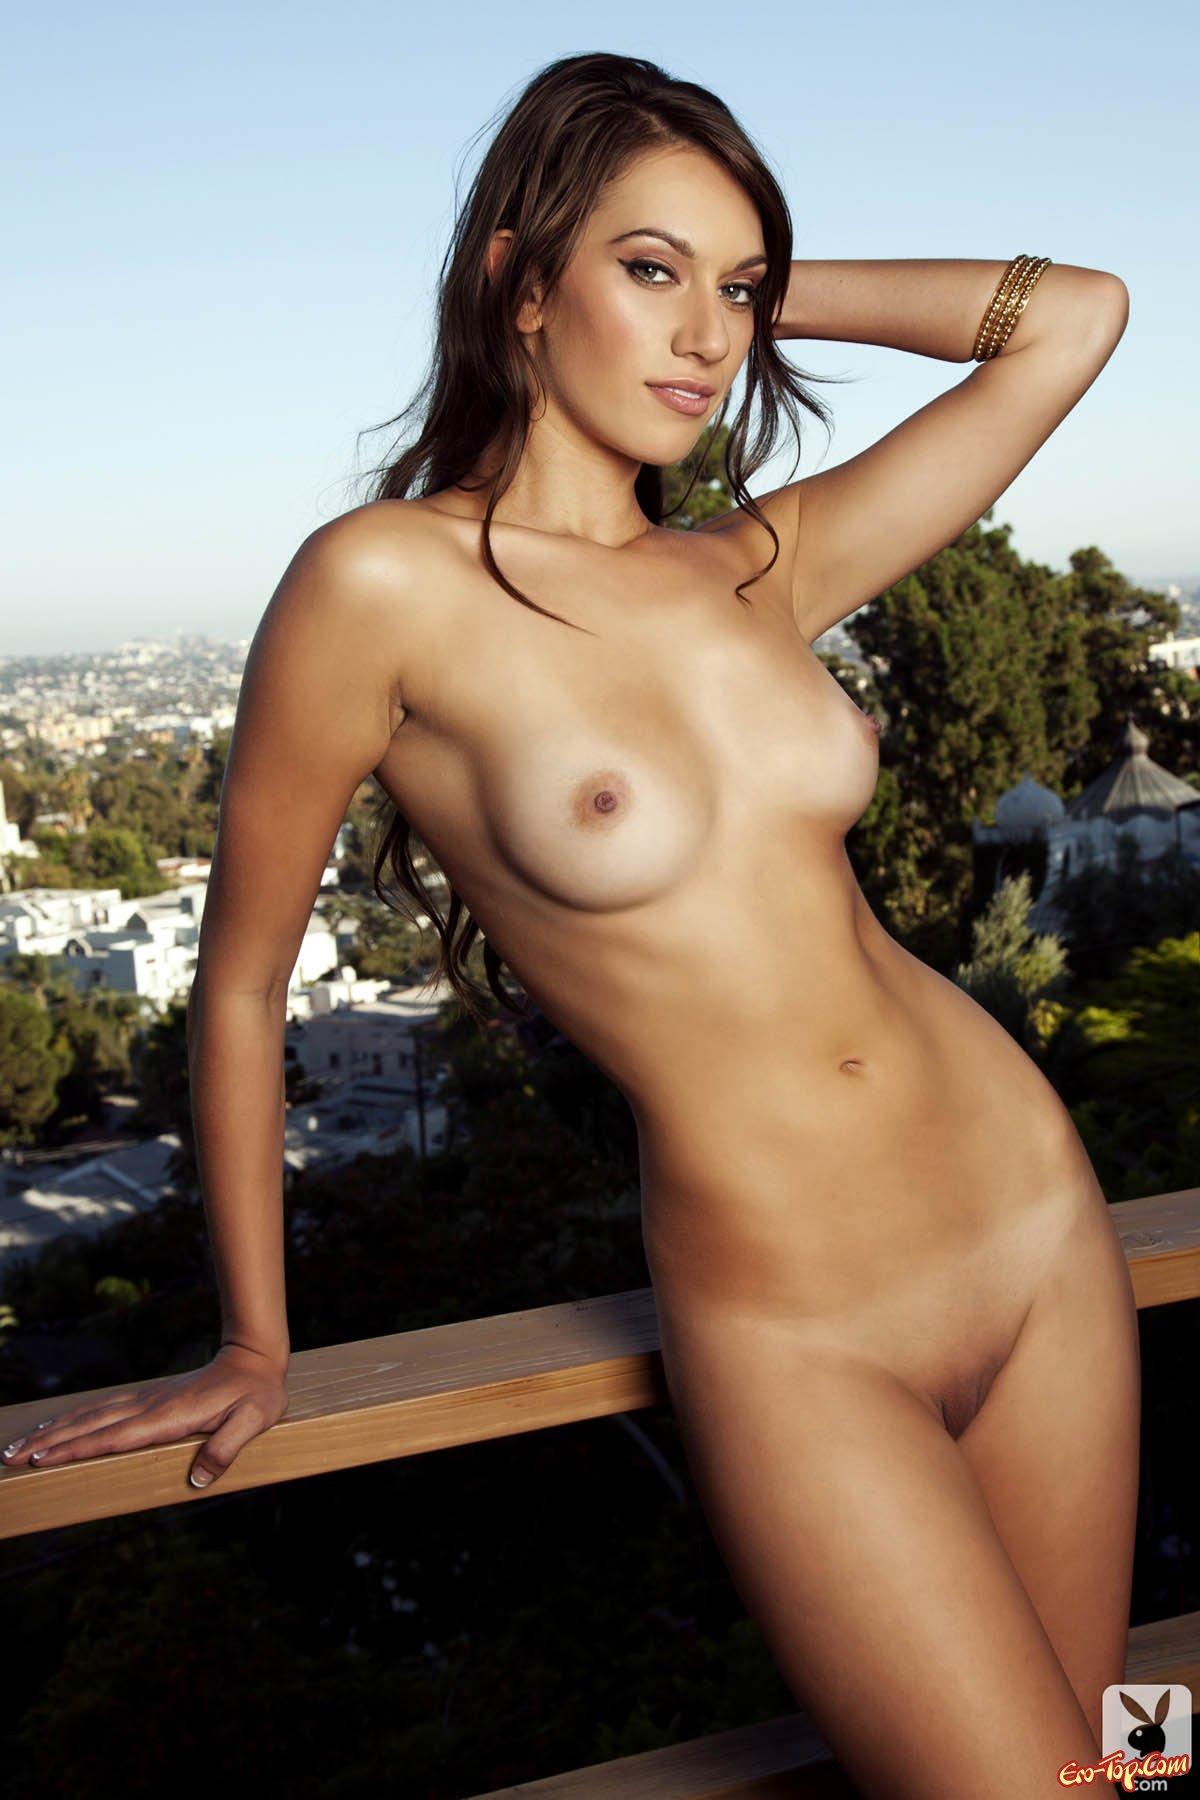 Sophie simmons nude fakes slut